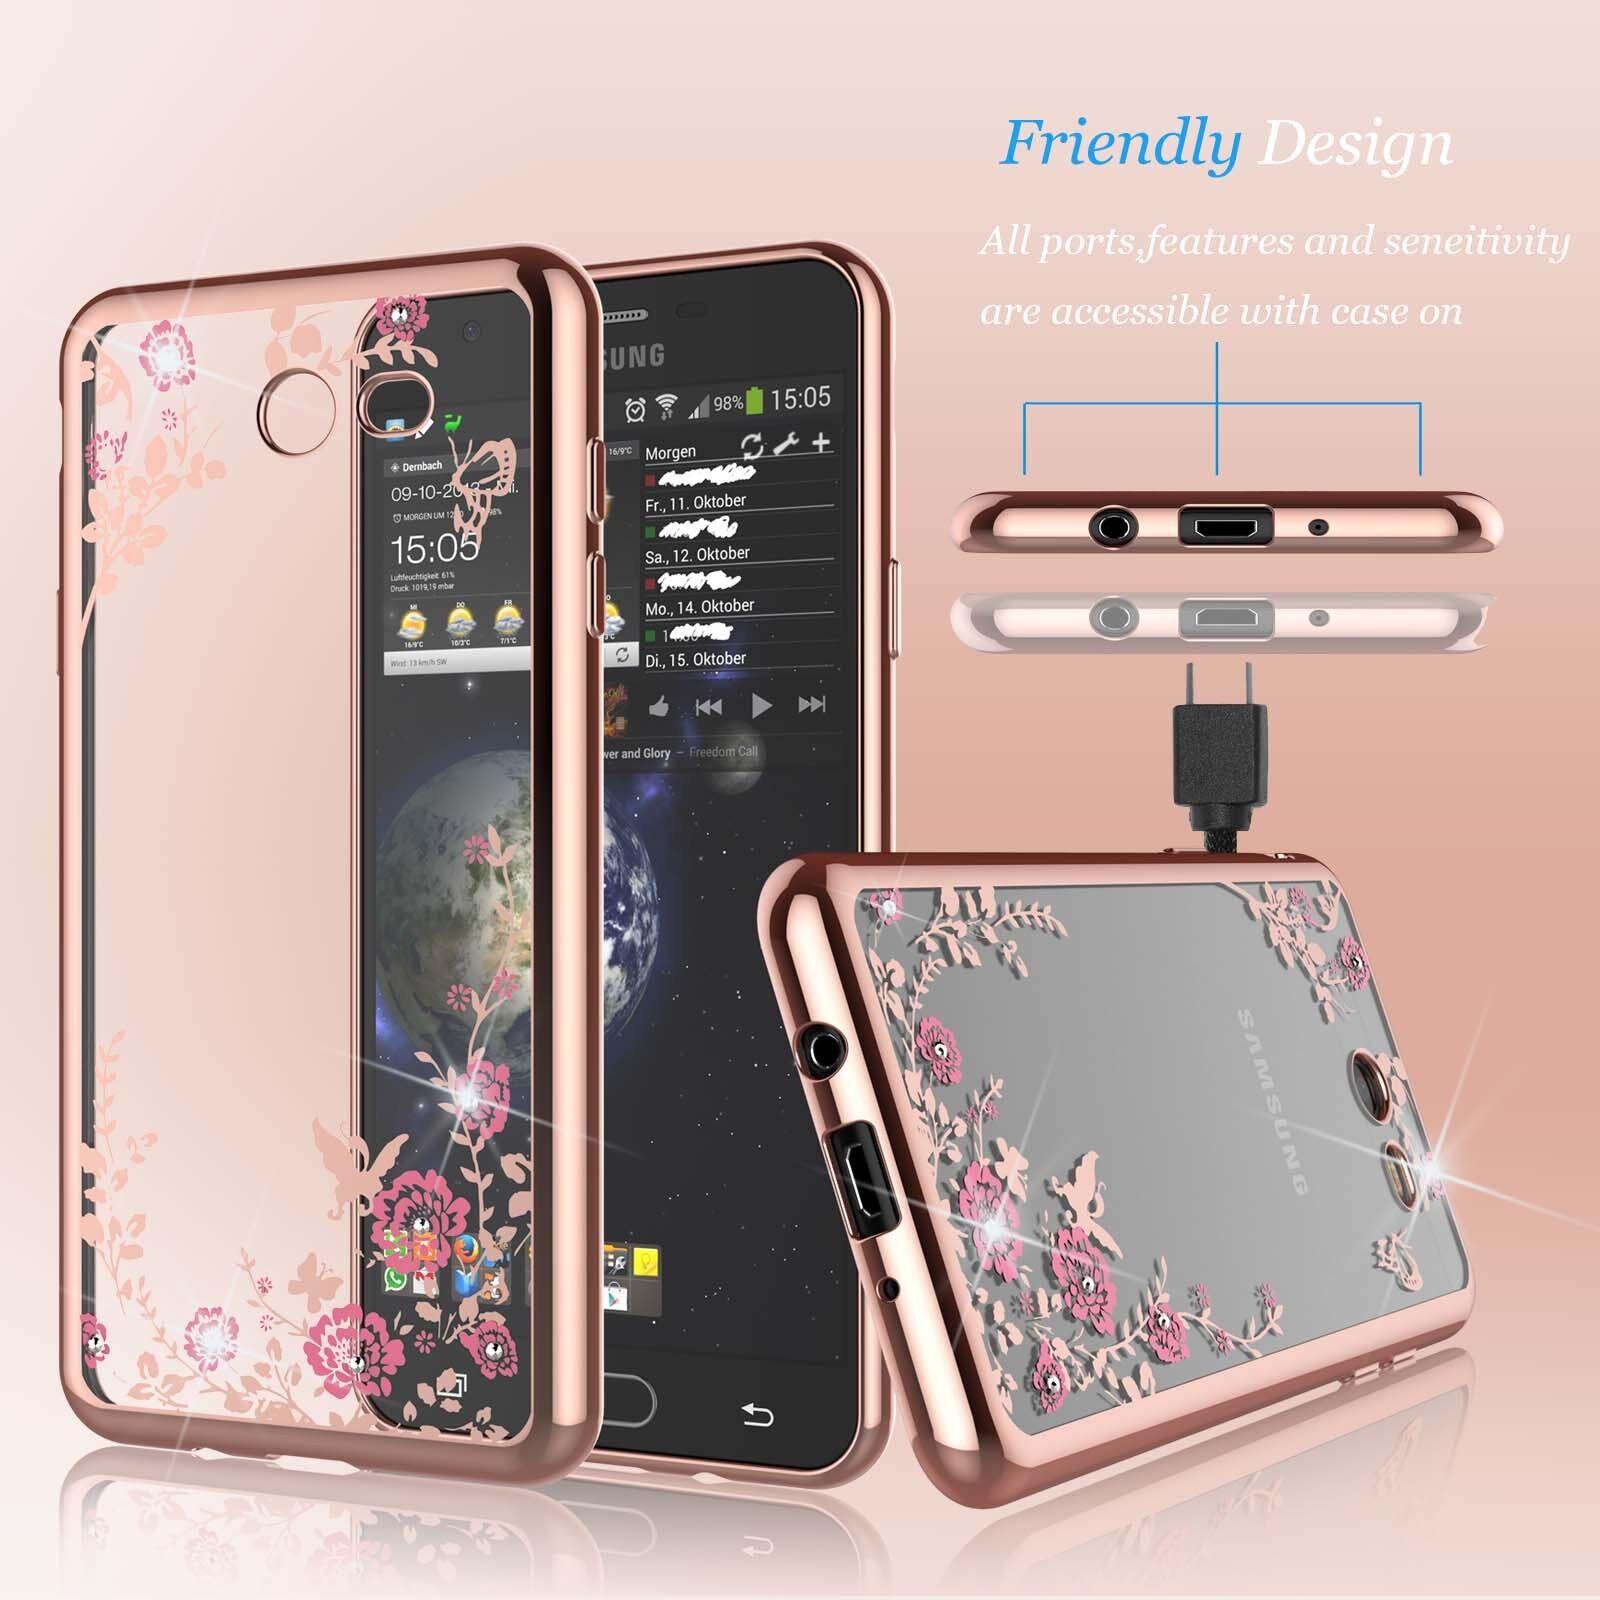 For Samsung Galaxy S7 S8 S9 Plus J3 Luna Pro J7 Sky Pro Luxu